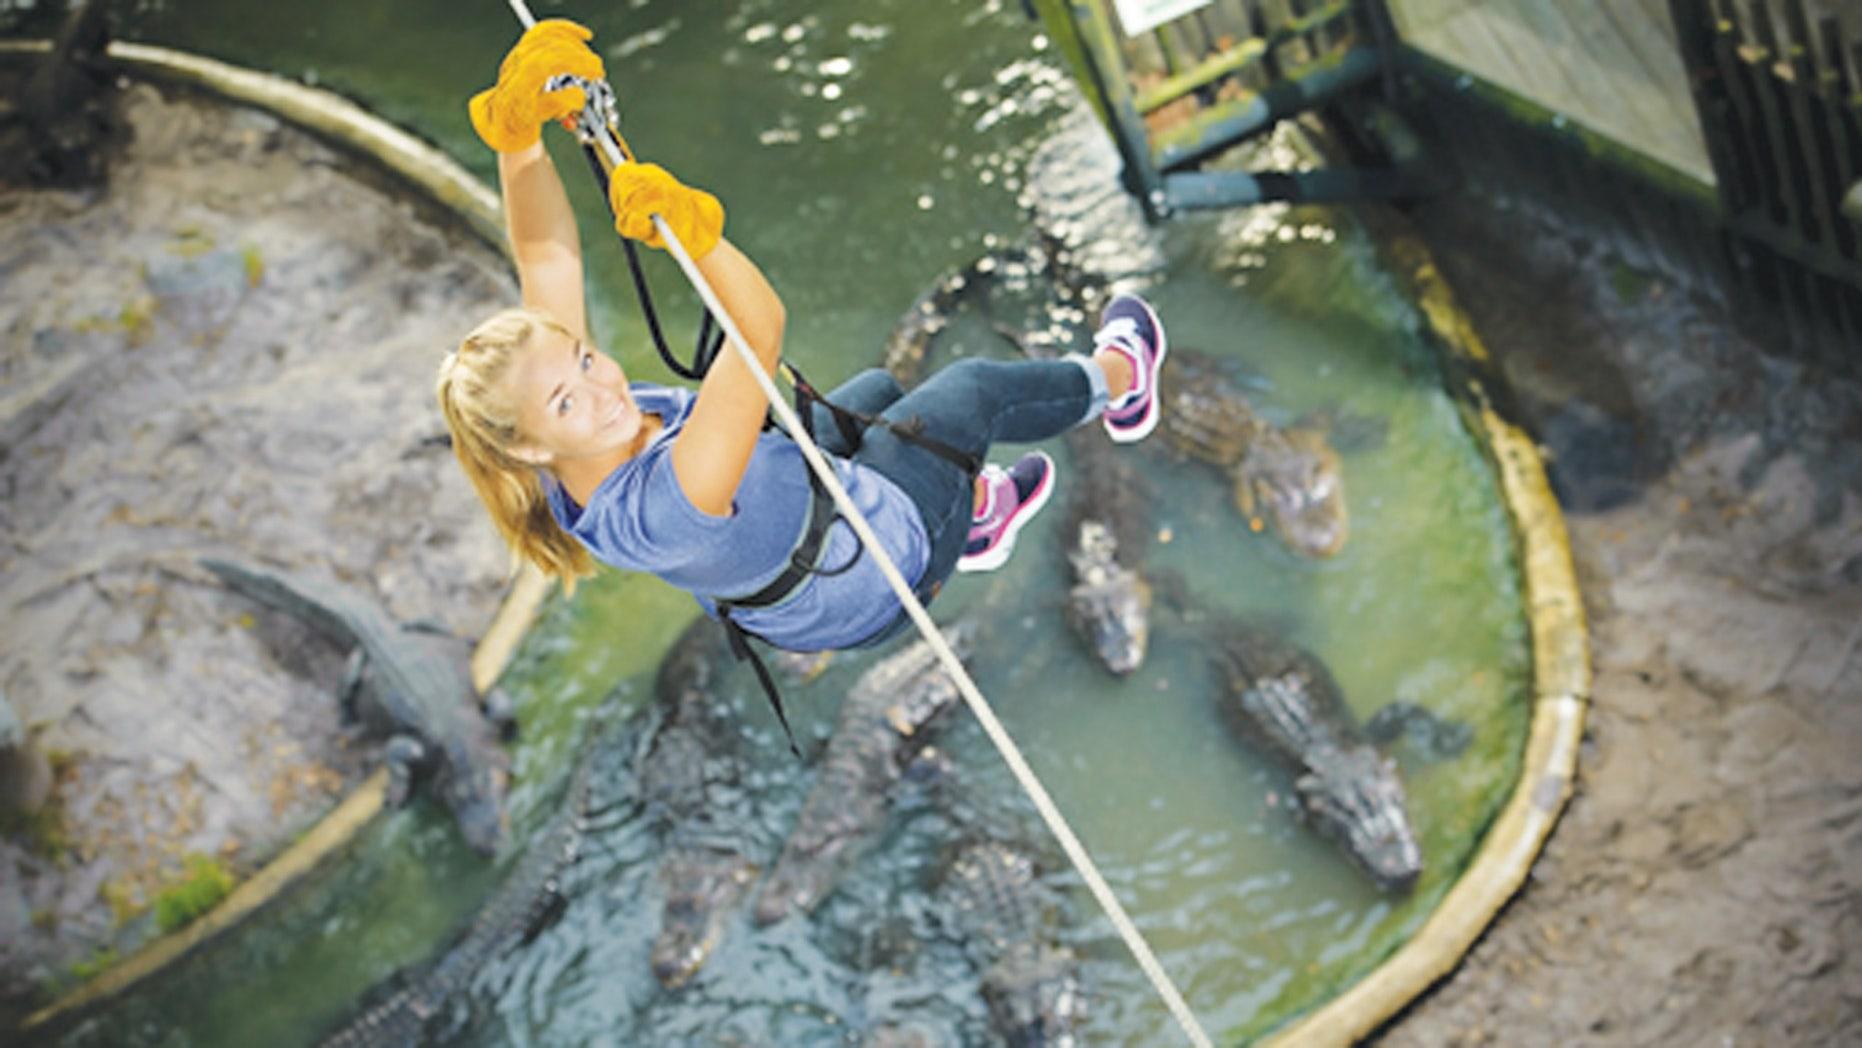 Soar over gators and crocs on Crocodile Crossing.